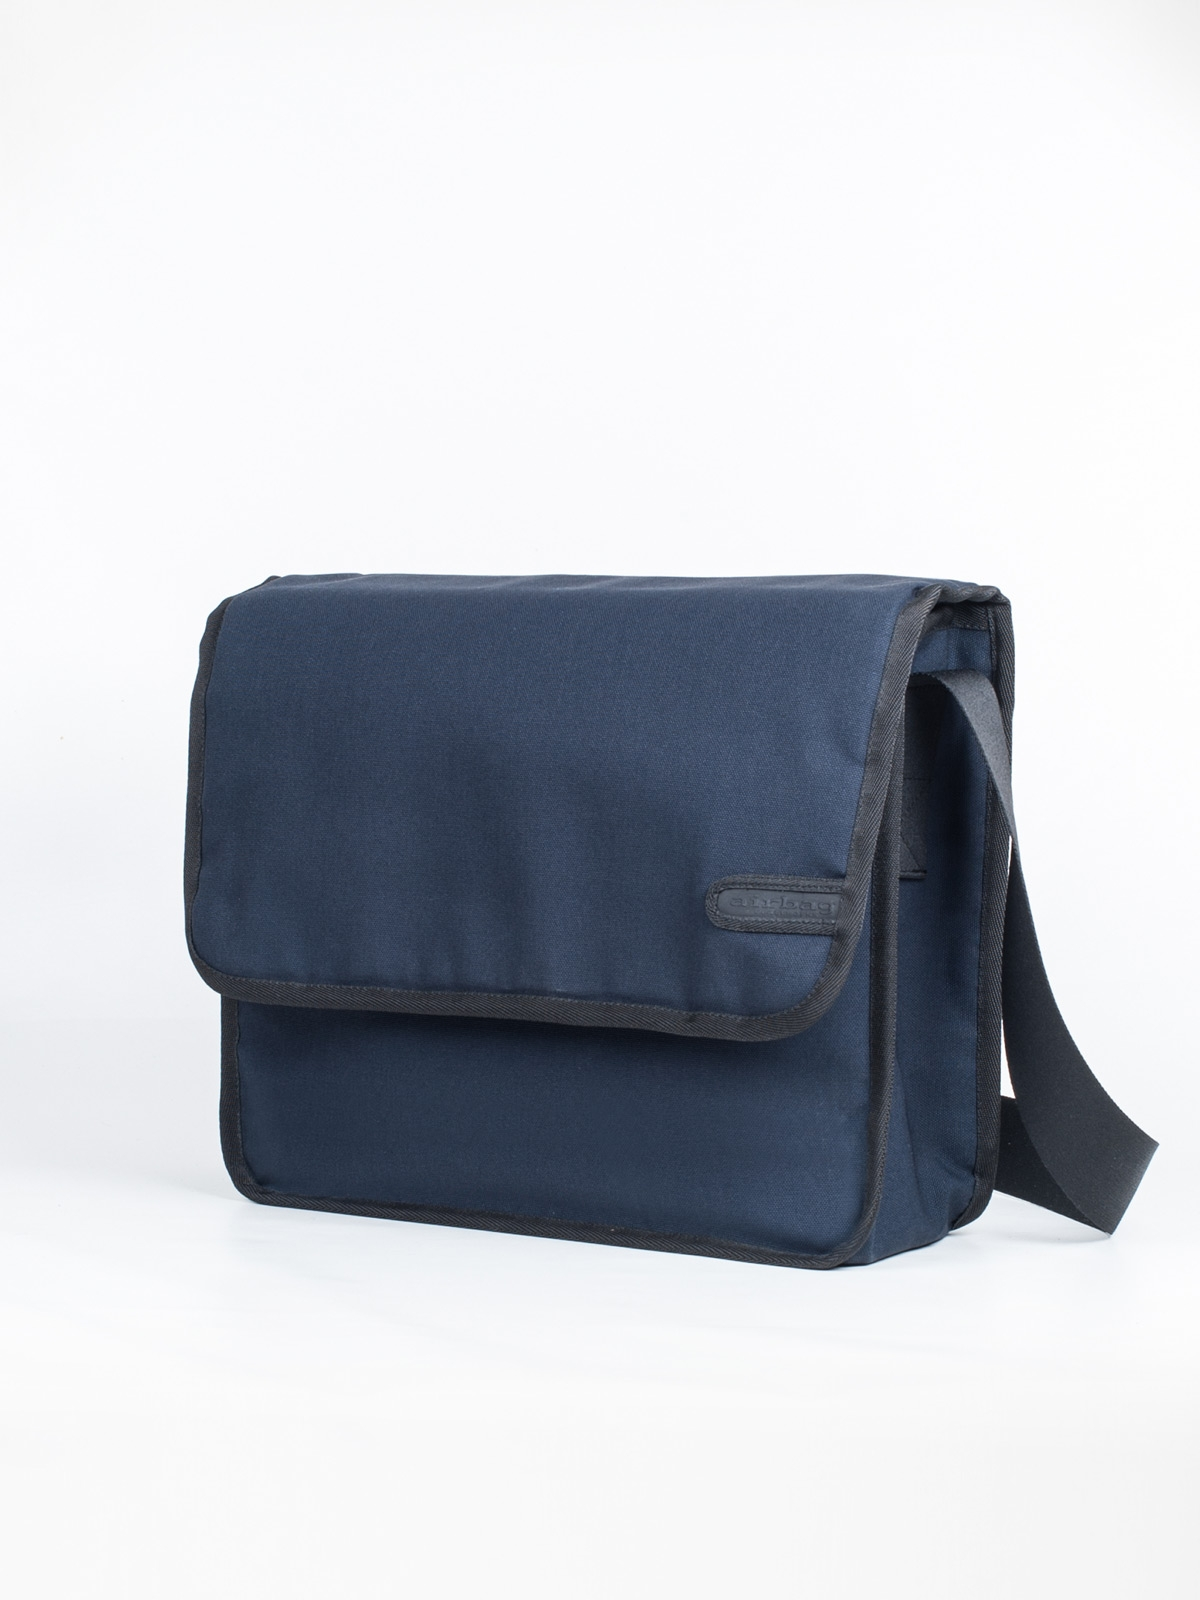 airbag craftworks deep blue